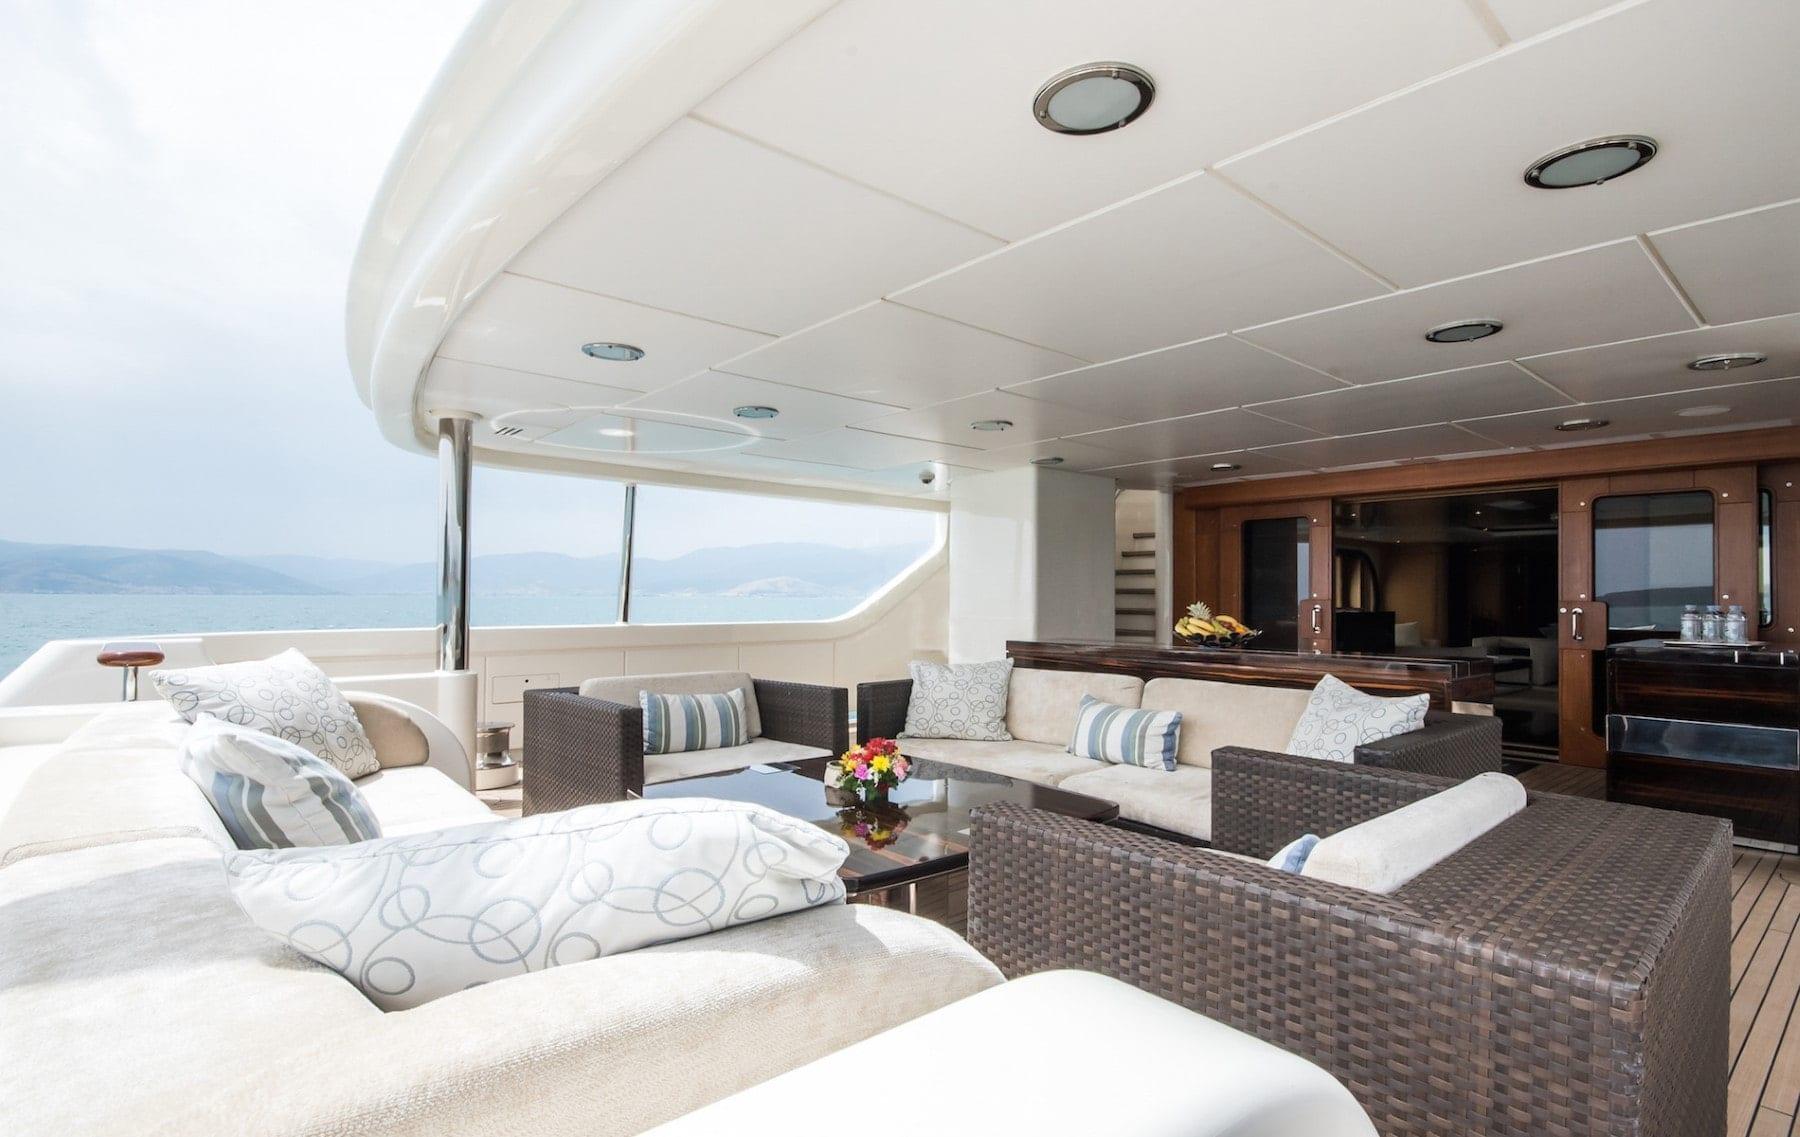 mercury megayacht aft deck (1) - Valef Yachts Chartering